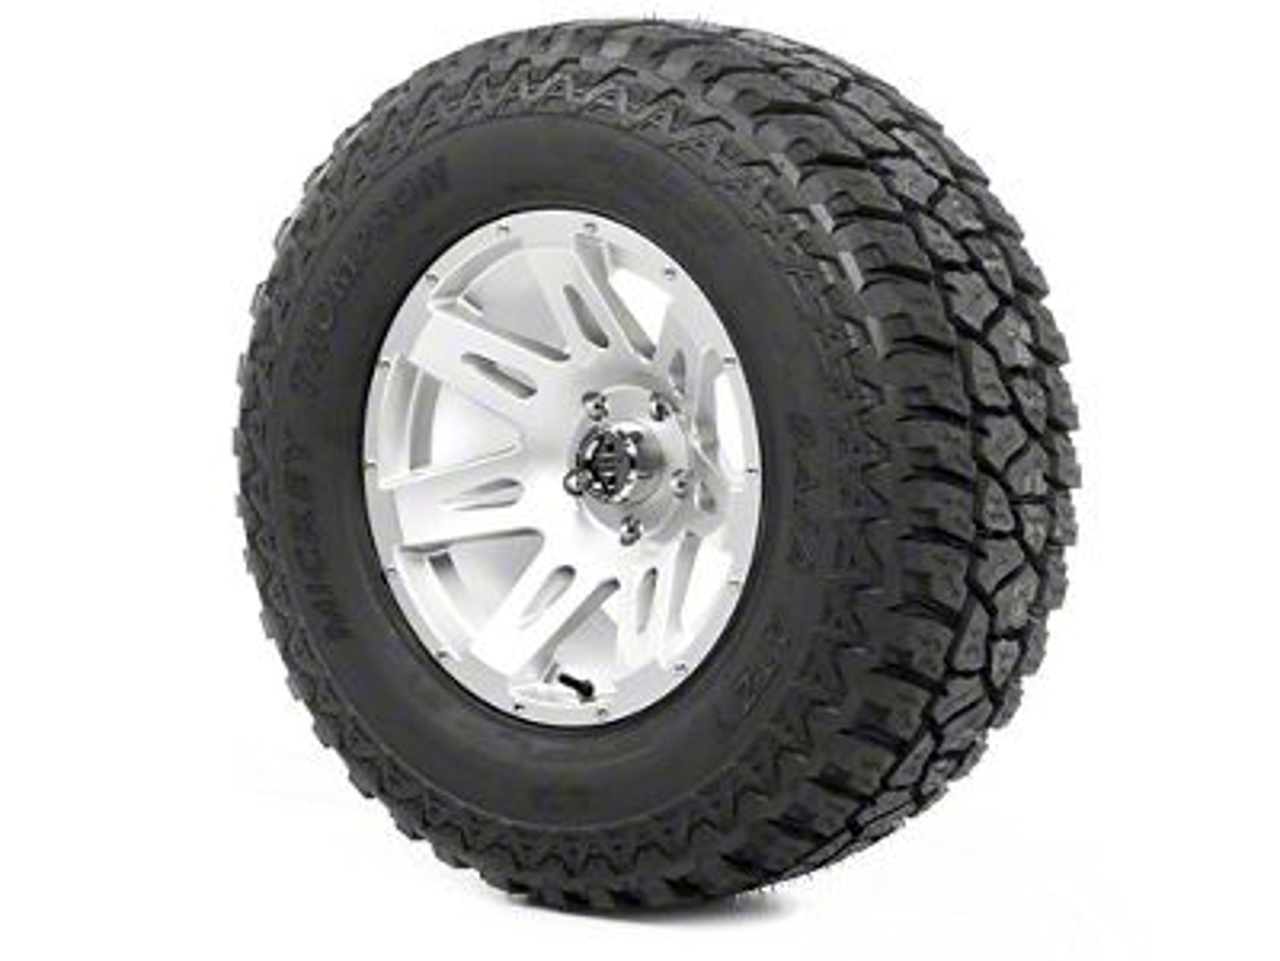 Rugged Ridge XHD Wheel 17x9 Silver and Mickey Thompson ATZ P3 315/70R17 Tire (13-18 Jeep Wrangler JK; 2018 Jeep Wrangler JL)